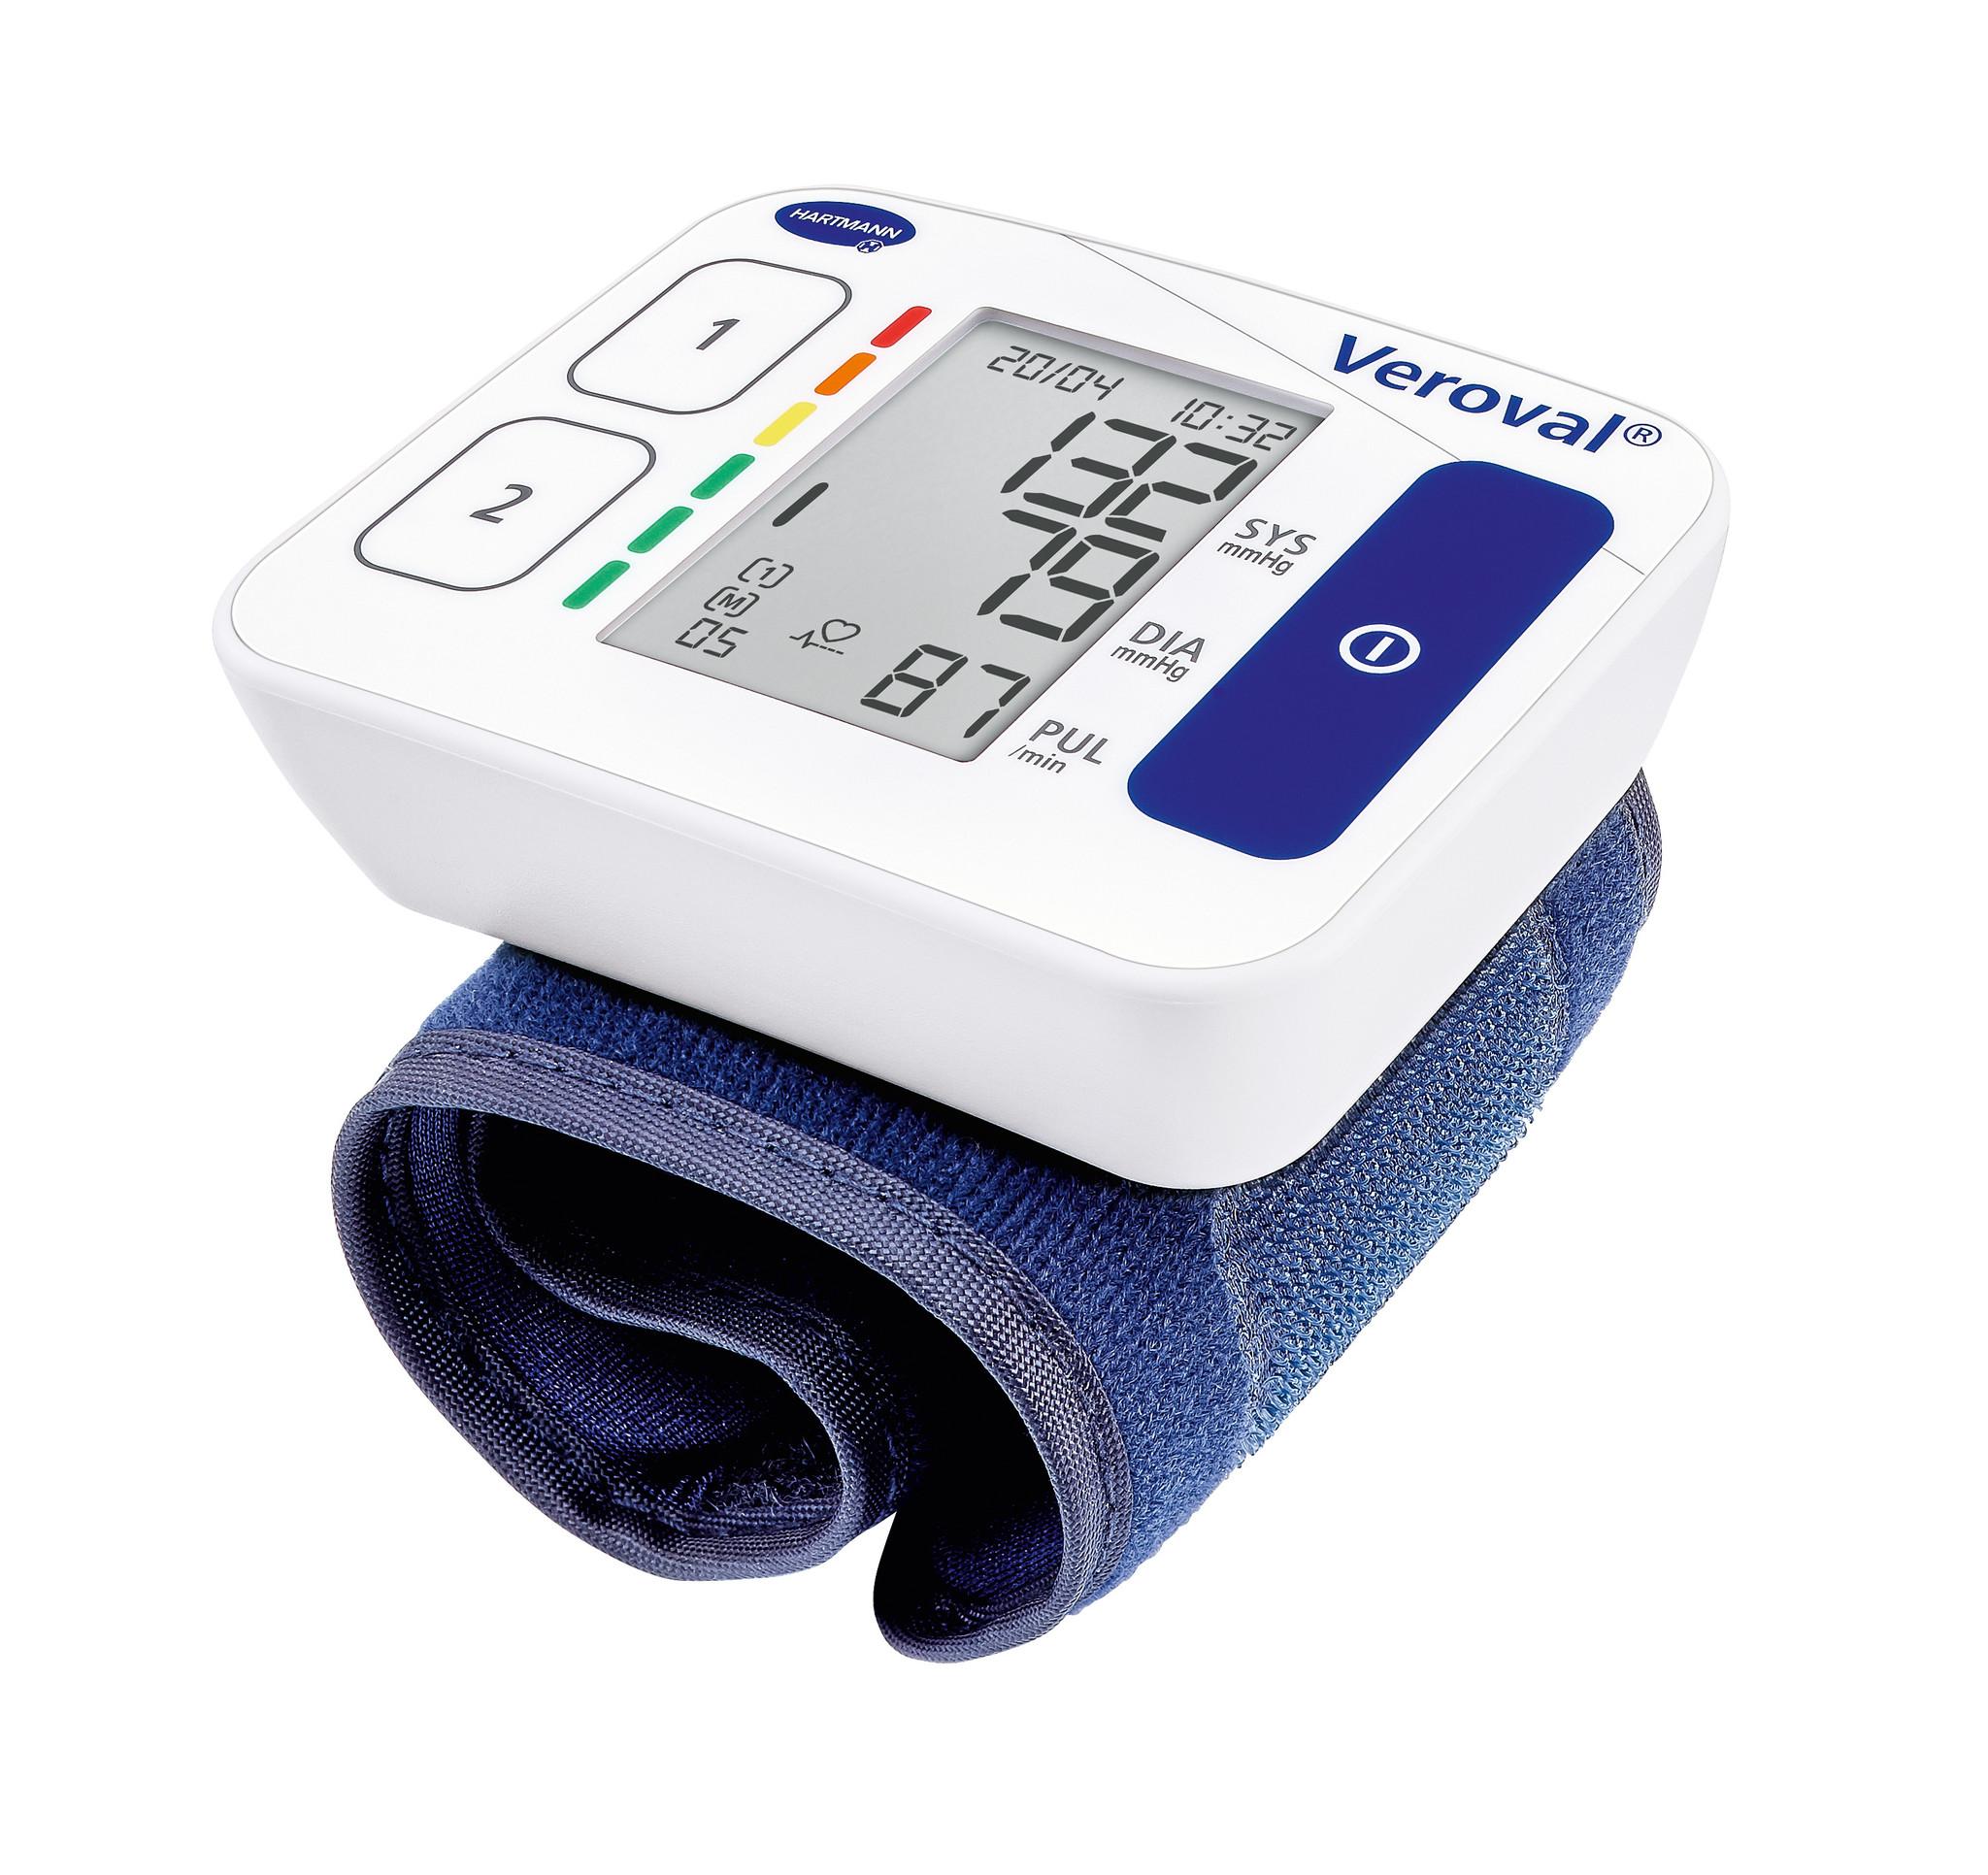 Hartmann Veroval Compact bloeddrukmeter - Pols